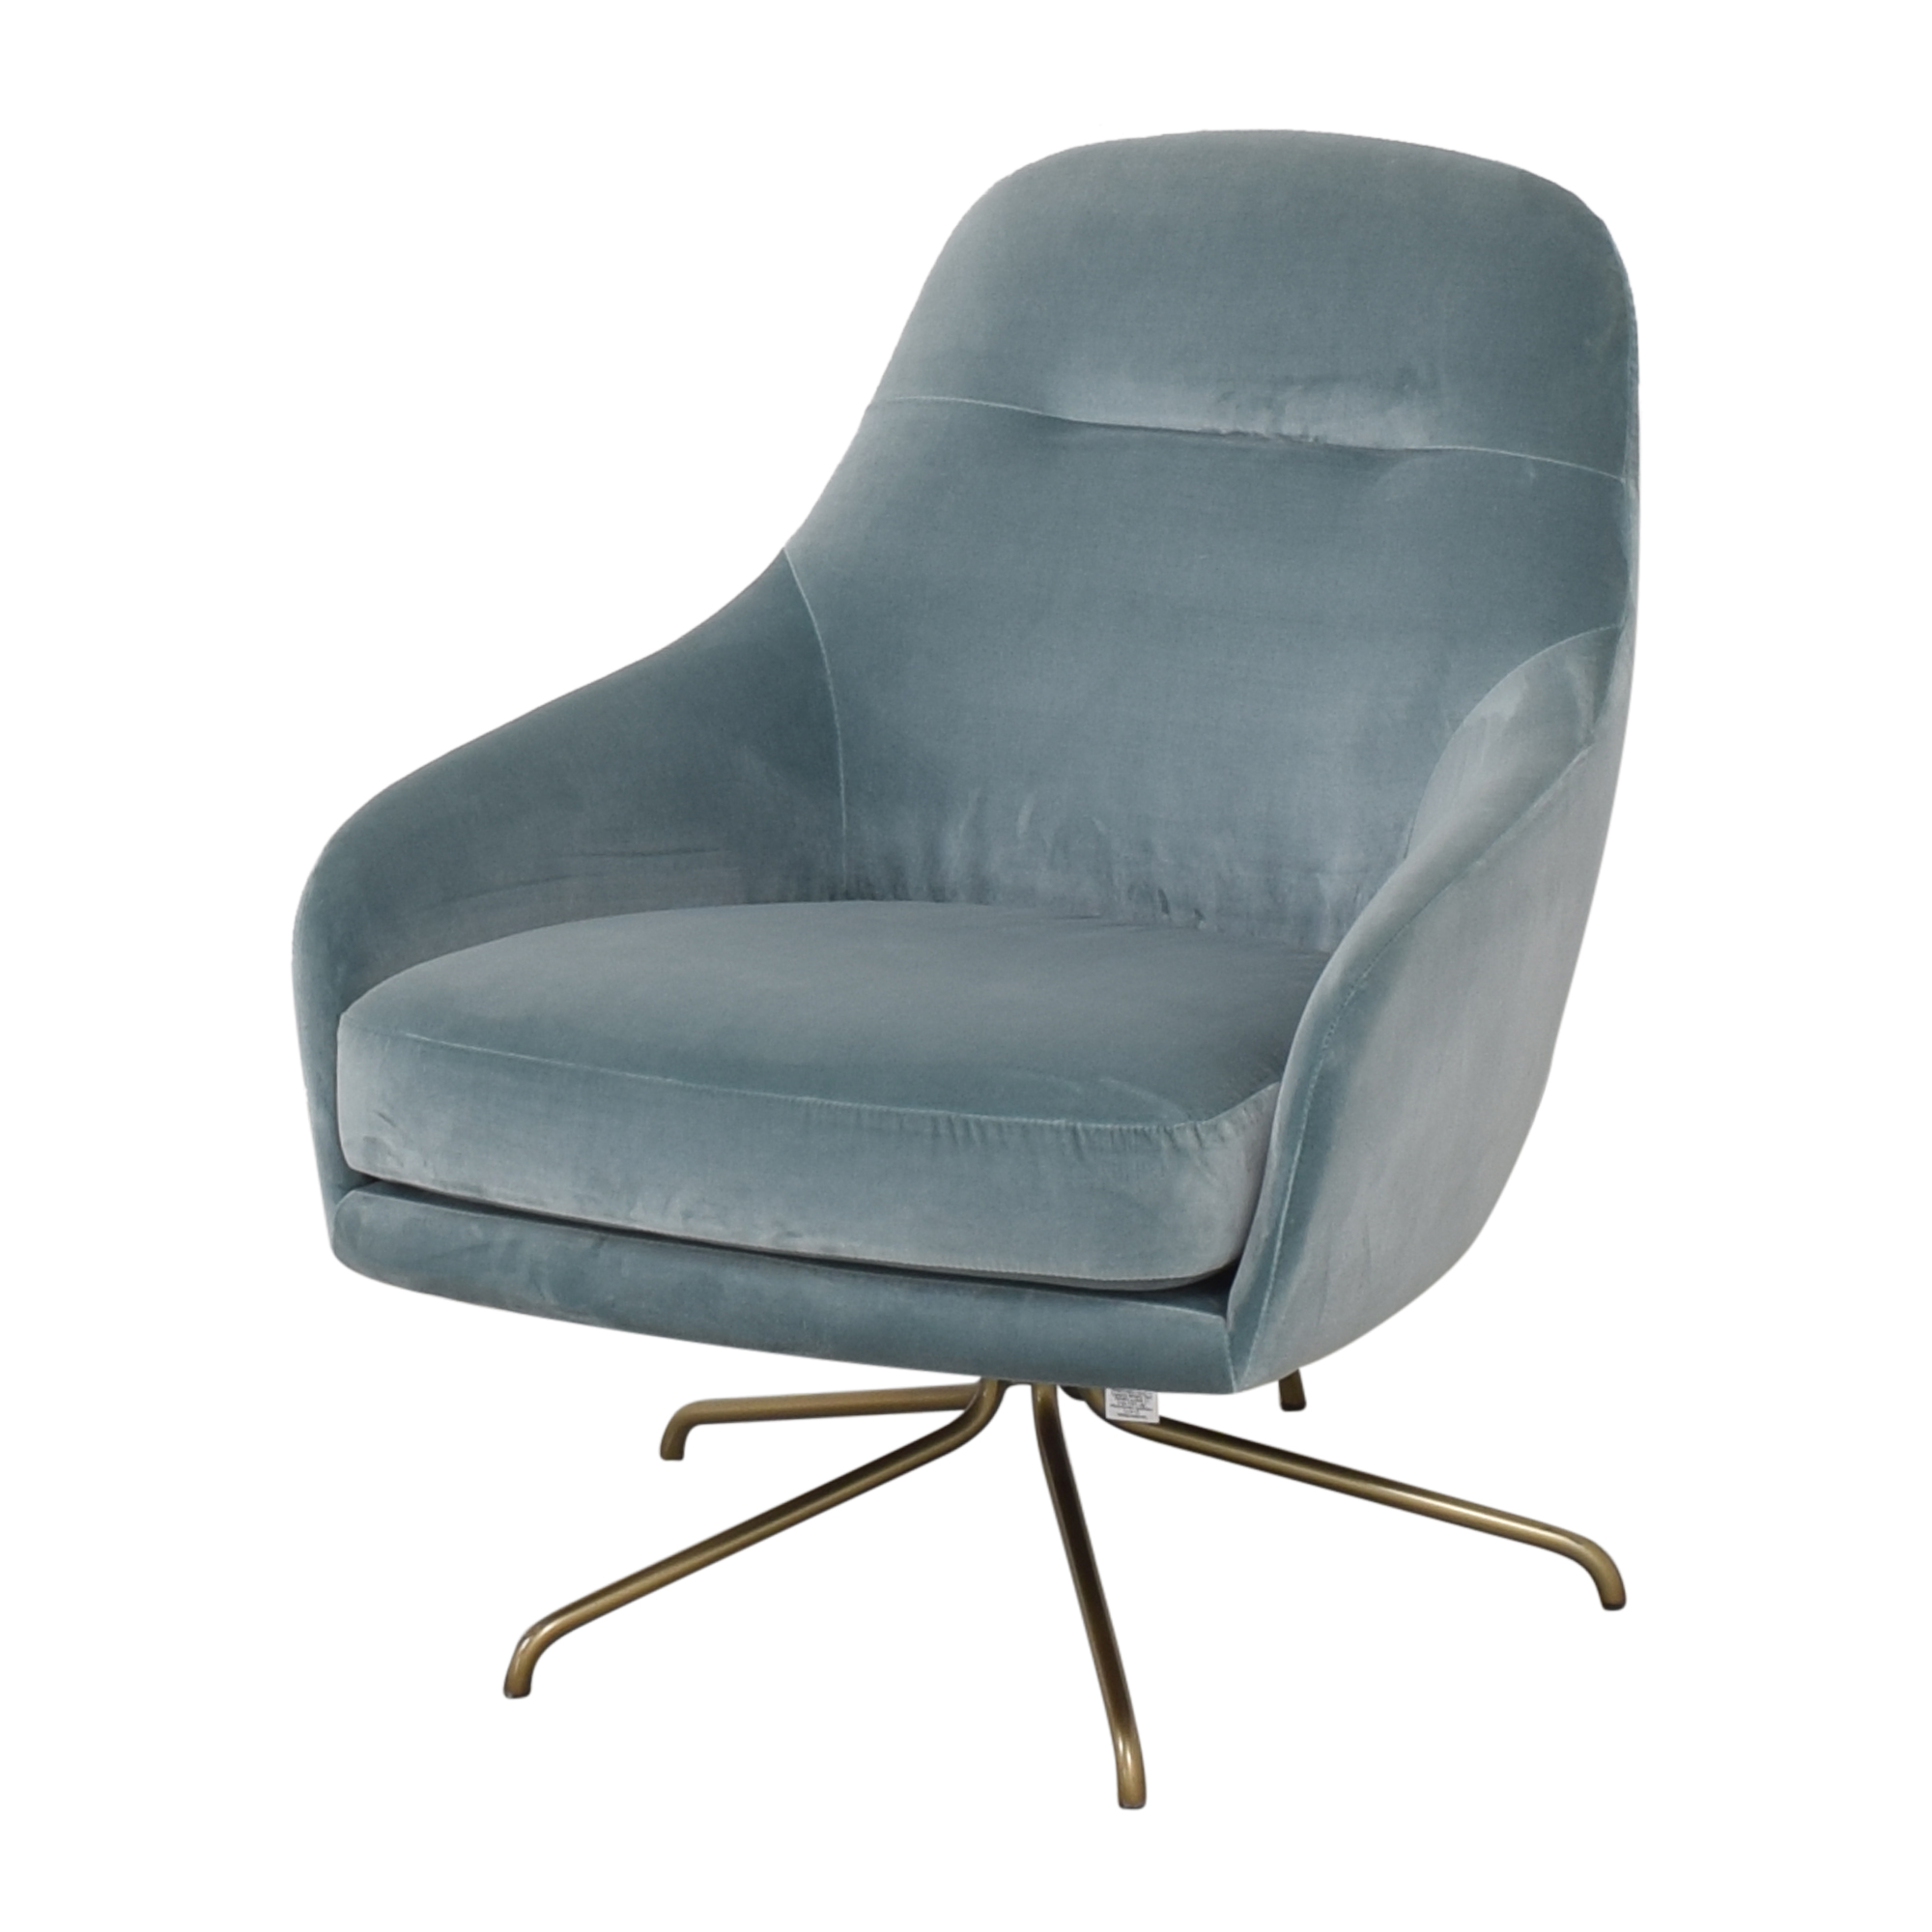 West Elm West Elm Valentina Swivel Chair ct